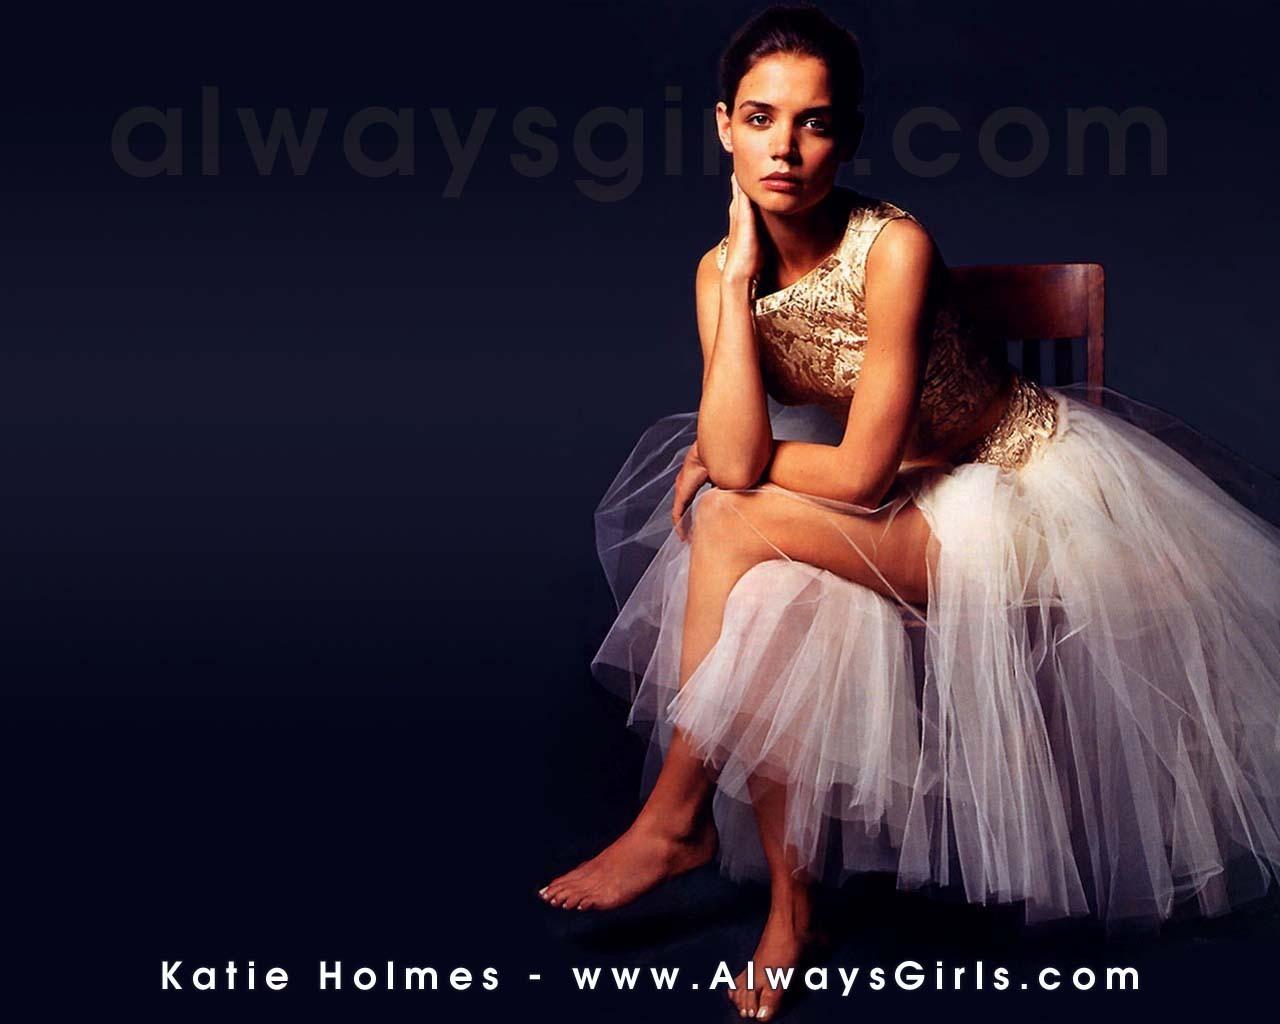 Katie Holmes - Katie H... Katie Holmes